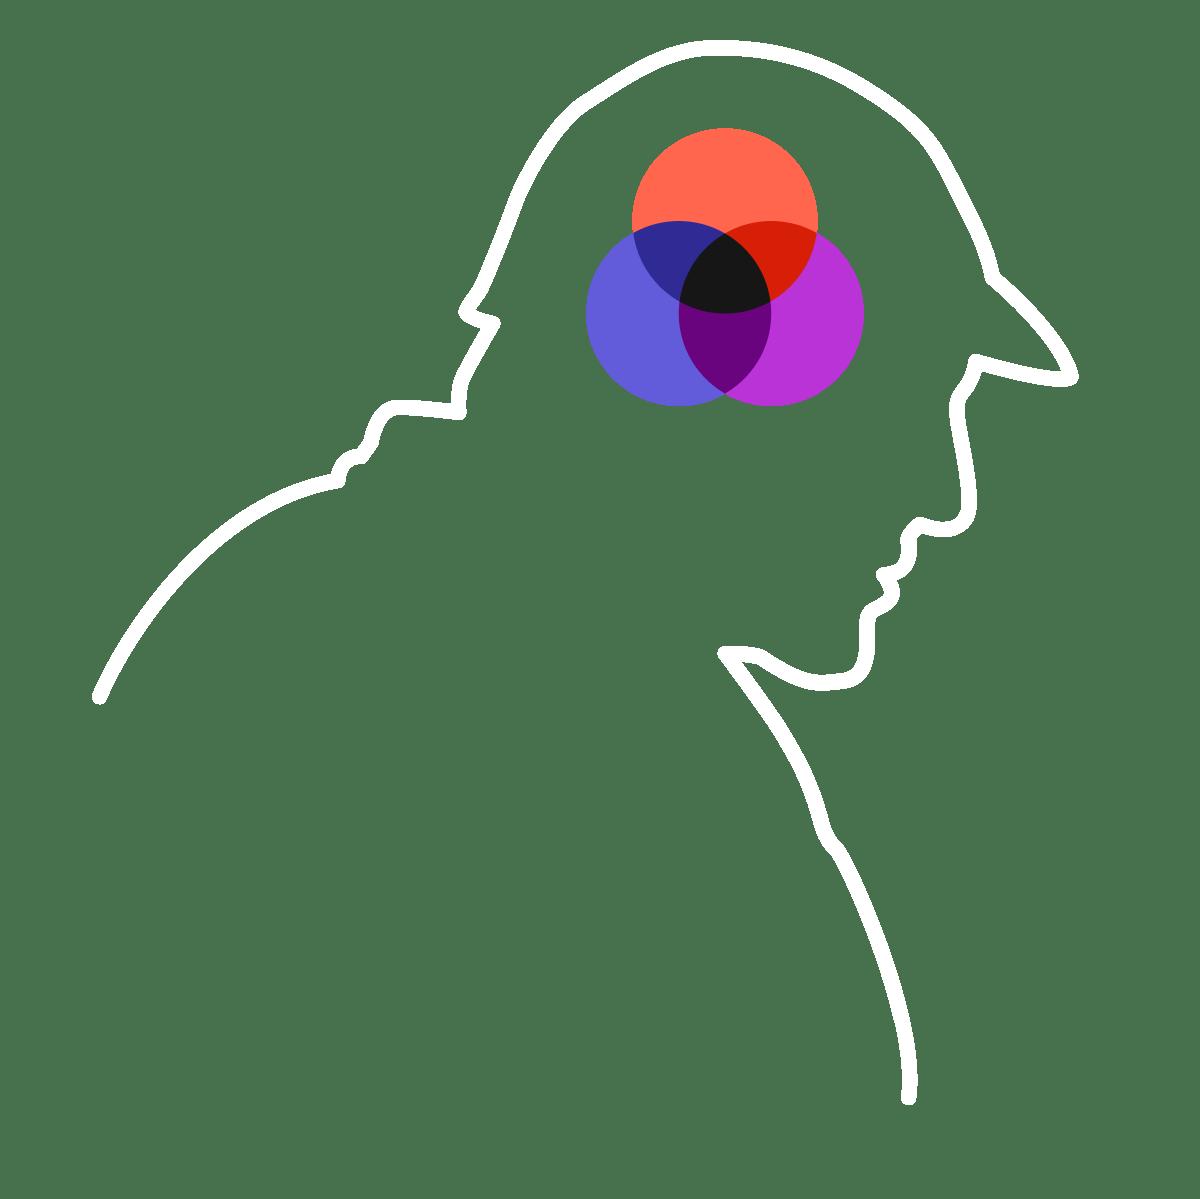 hight resolution of logic euler diagram